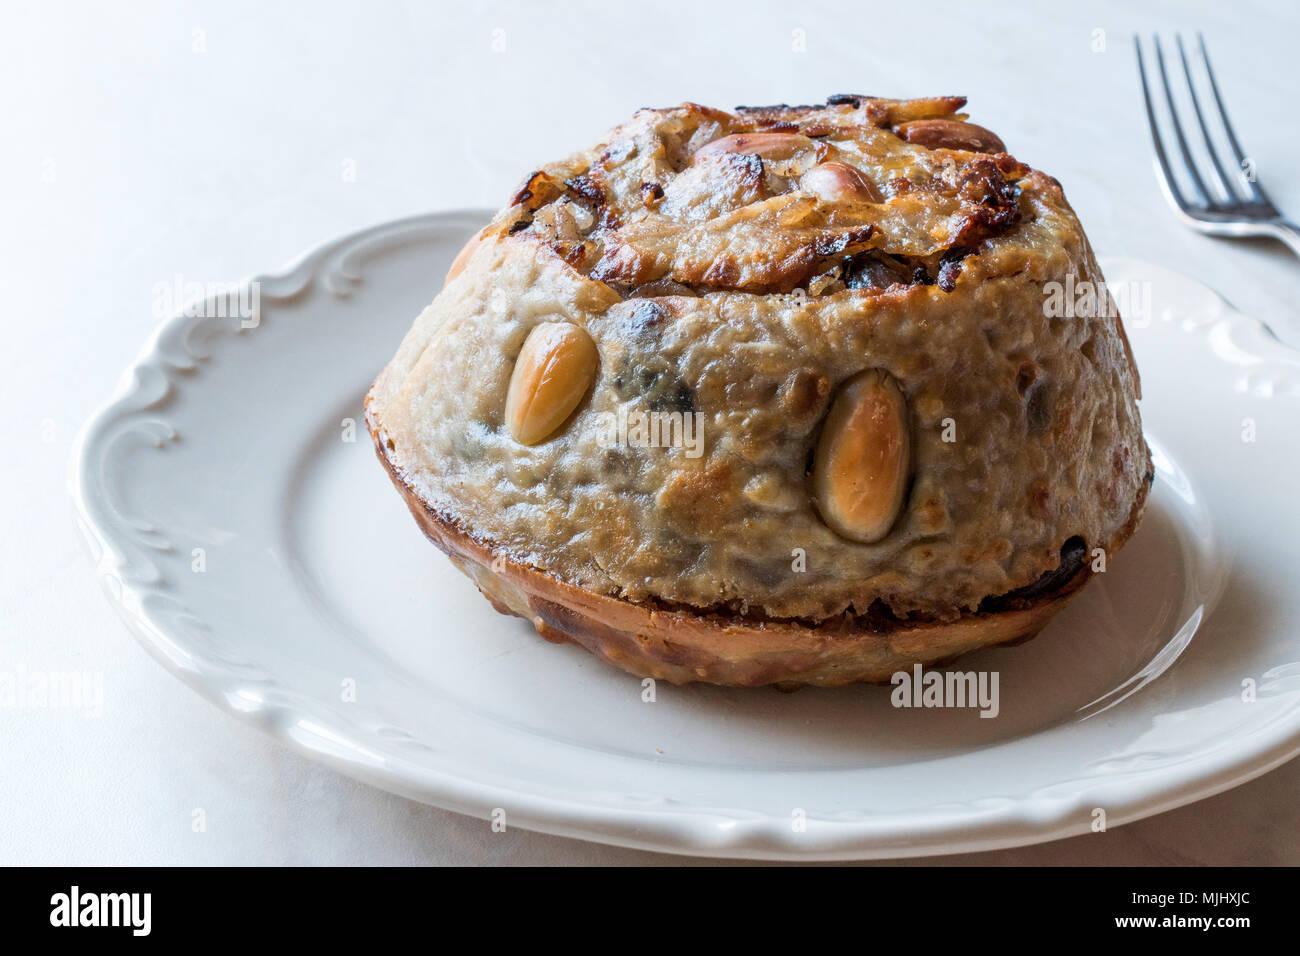 Turkish Perde Pilavi / Drape pilaf with chicken, almond and raisin / Pilav. Traditional Food. - Stock Image